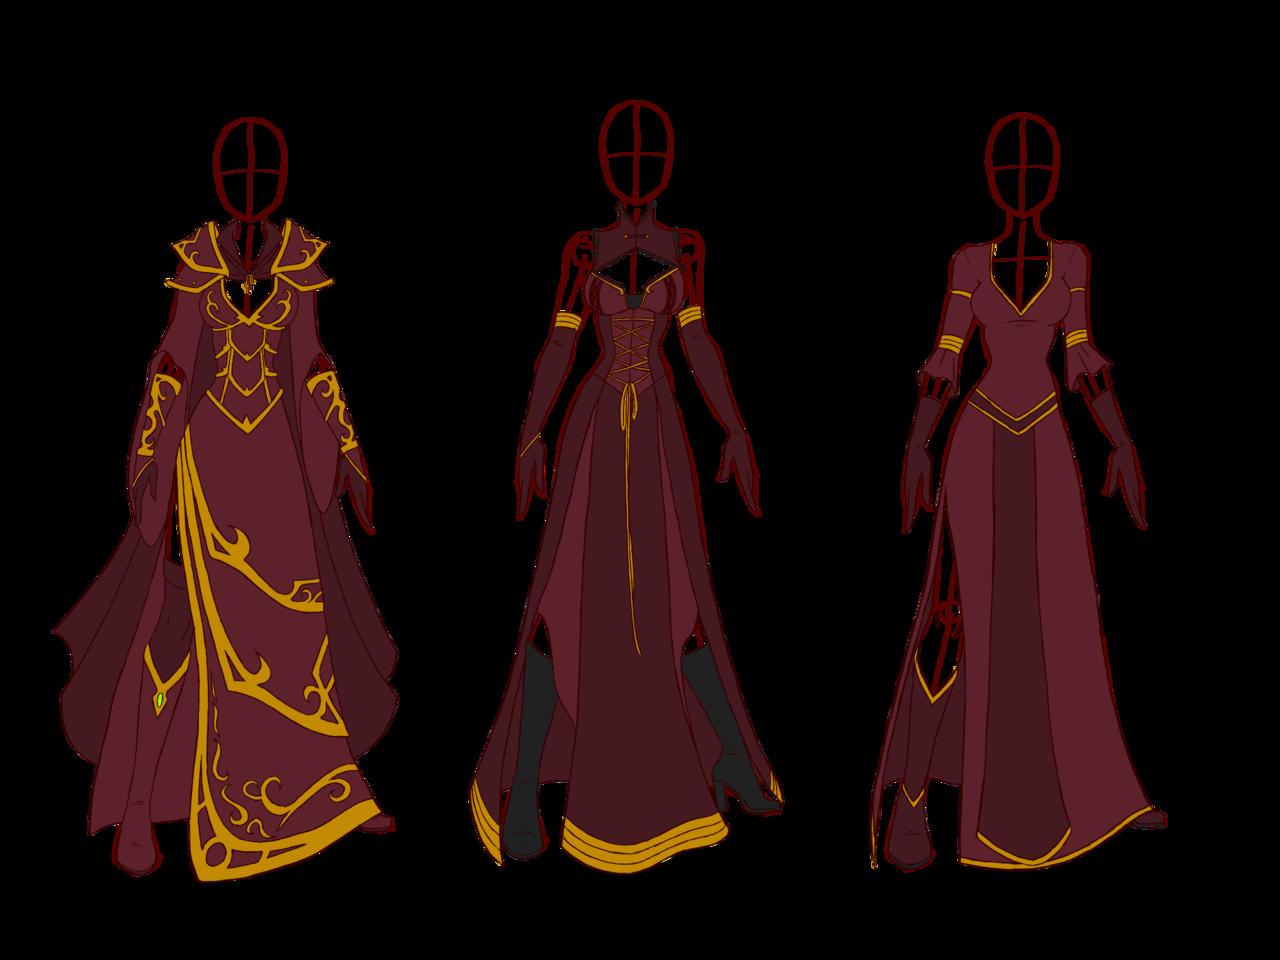 Pin By Nebula Rising On Robin Hood Art Clothes Fantasy Clothing Anime Dress